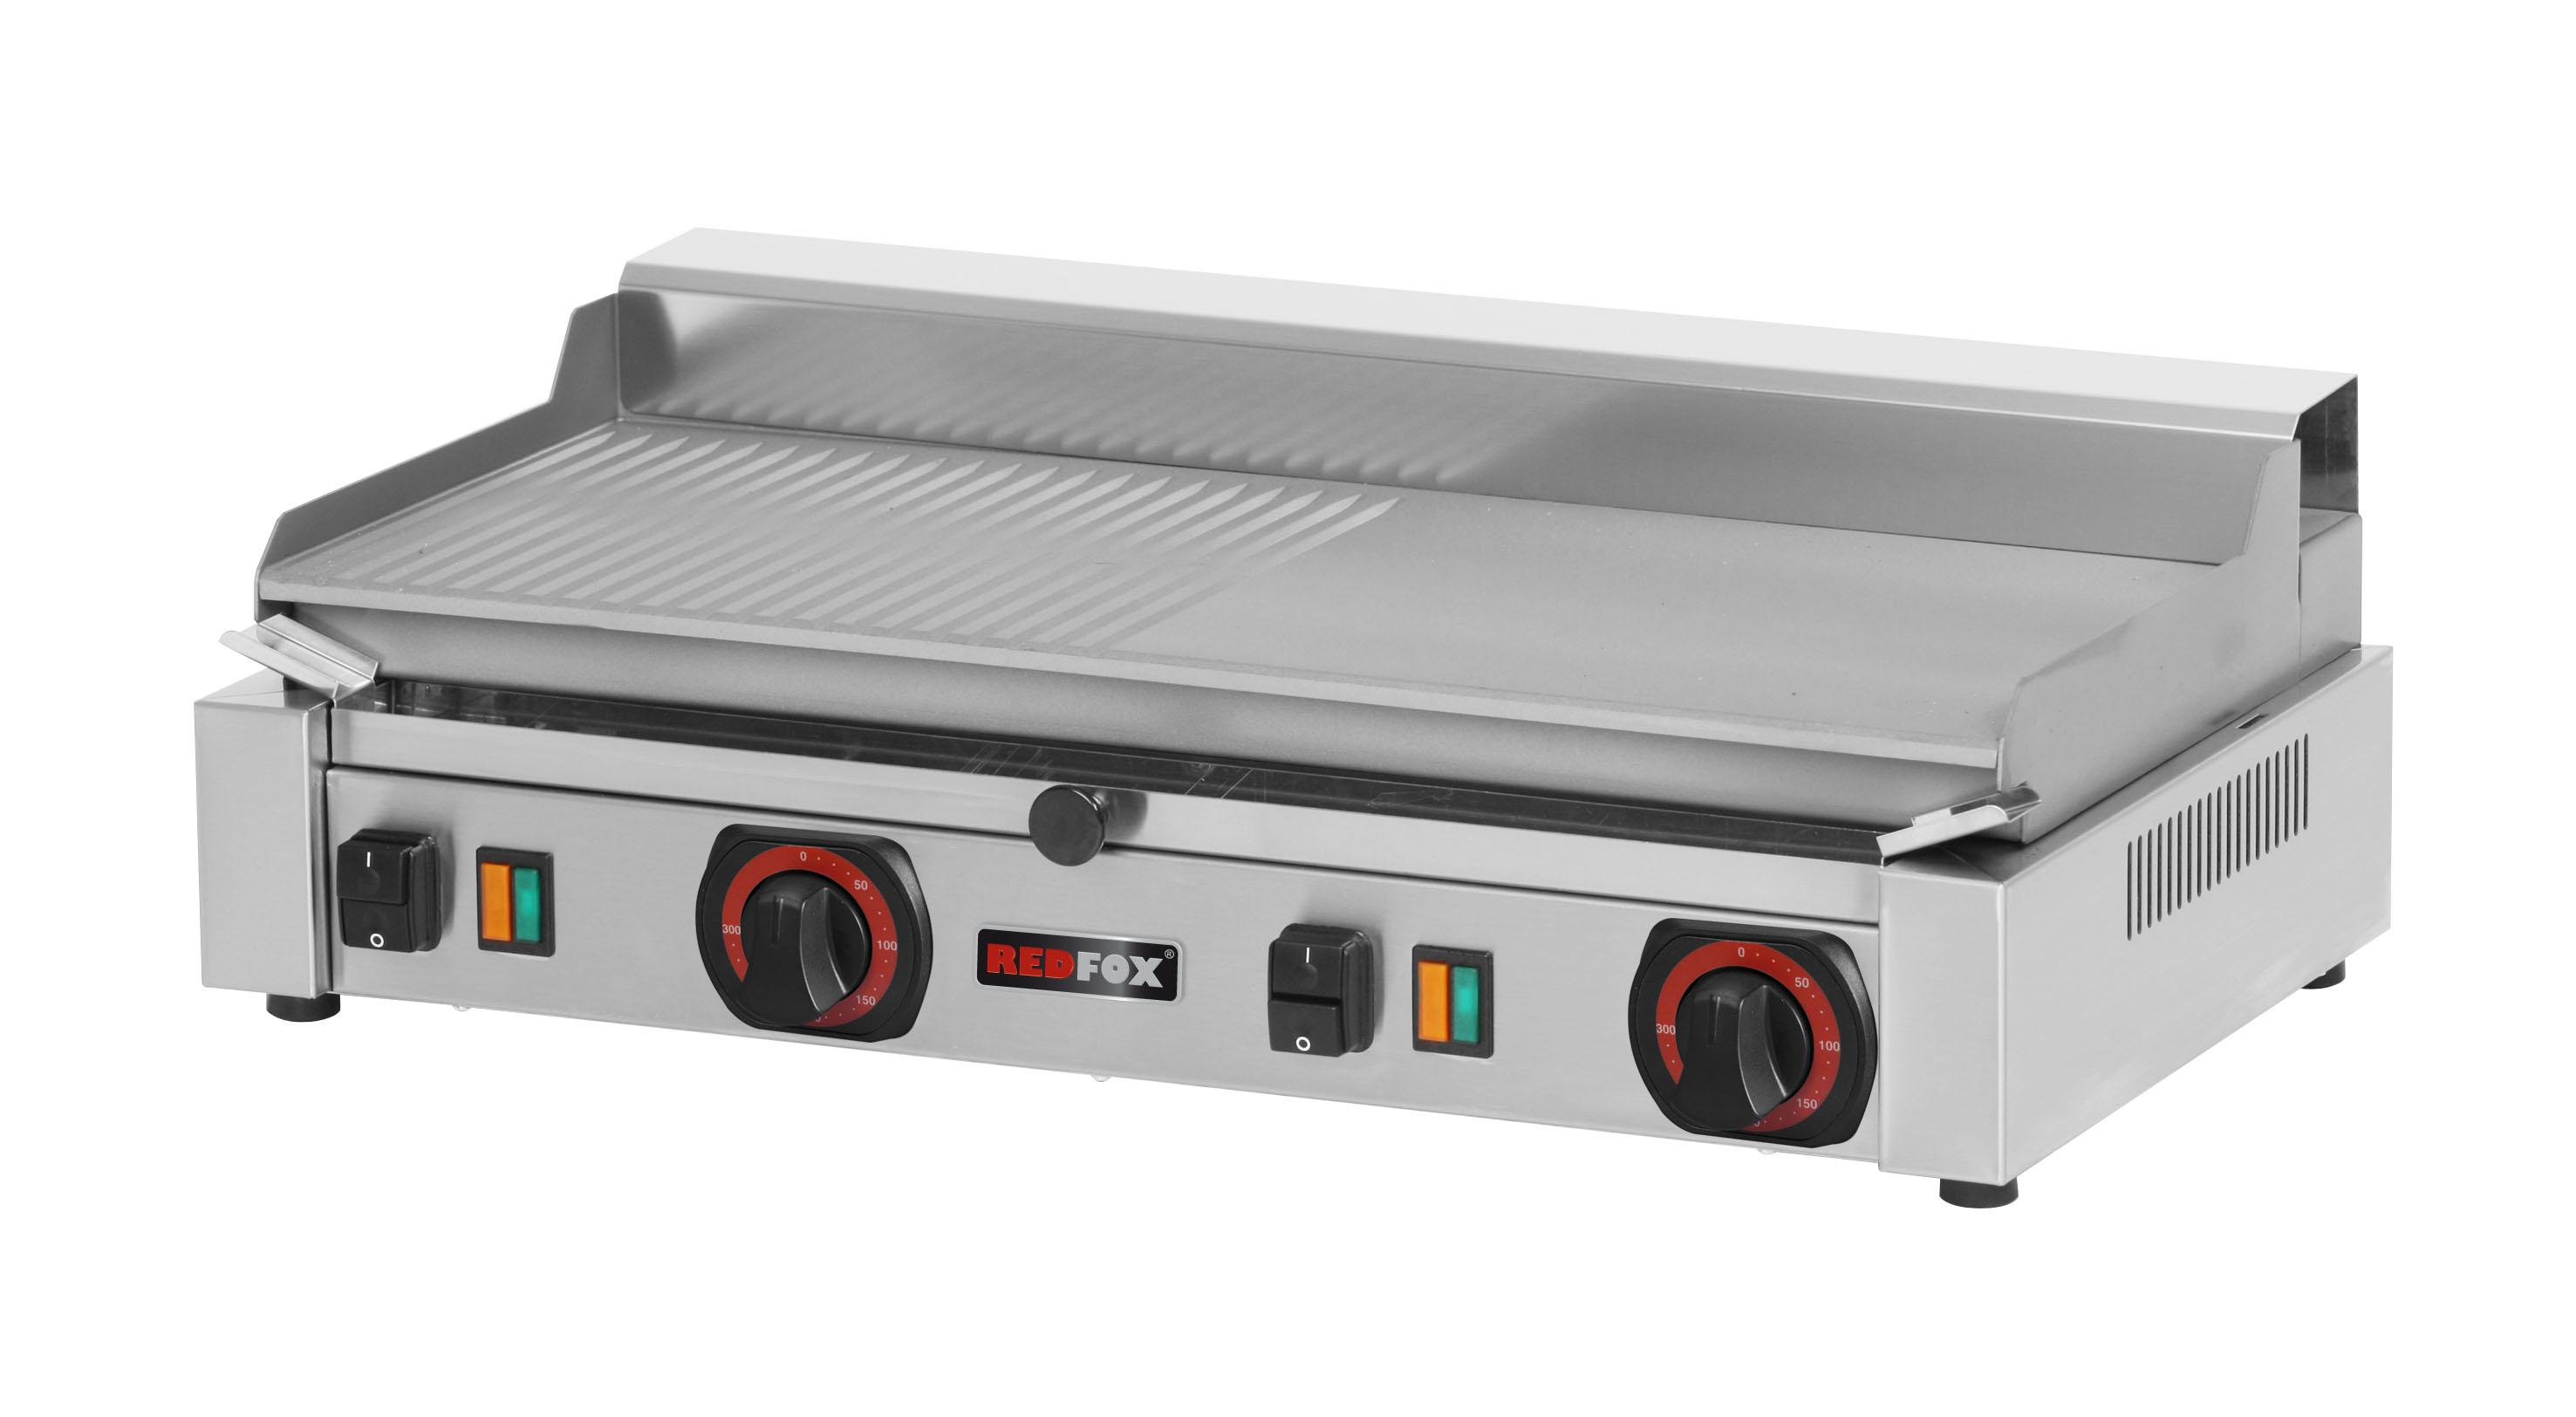 Deska grilovací elektrická PD 2020 BM kombinovaná ocelová RedFox